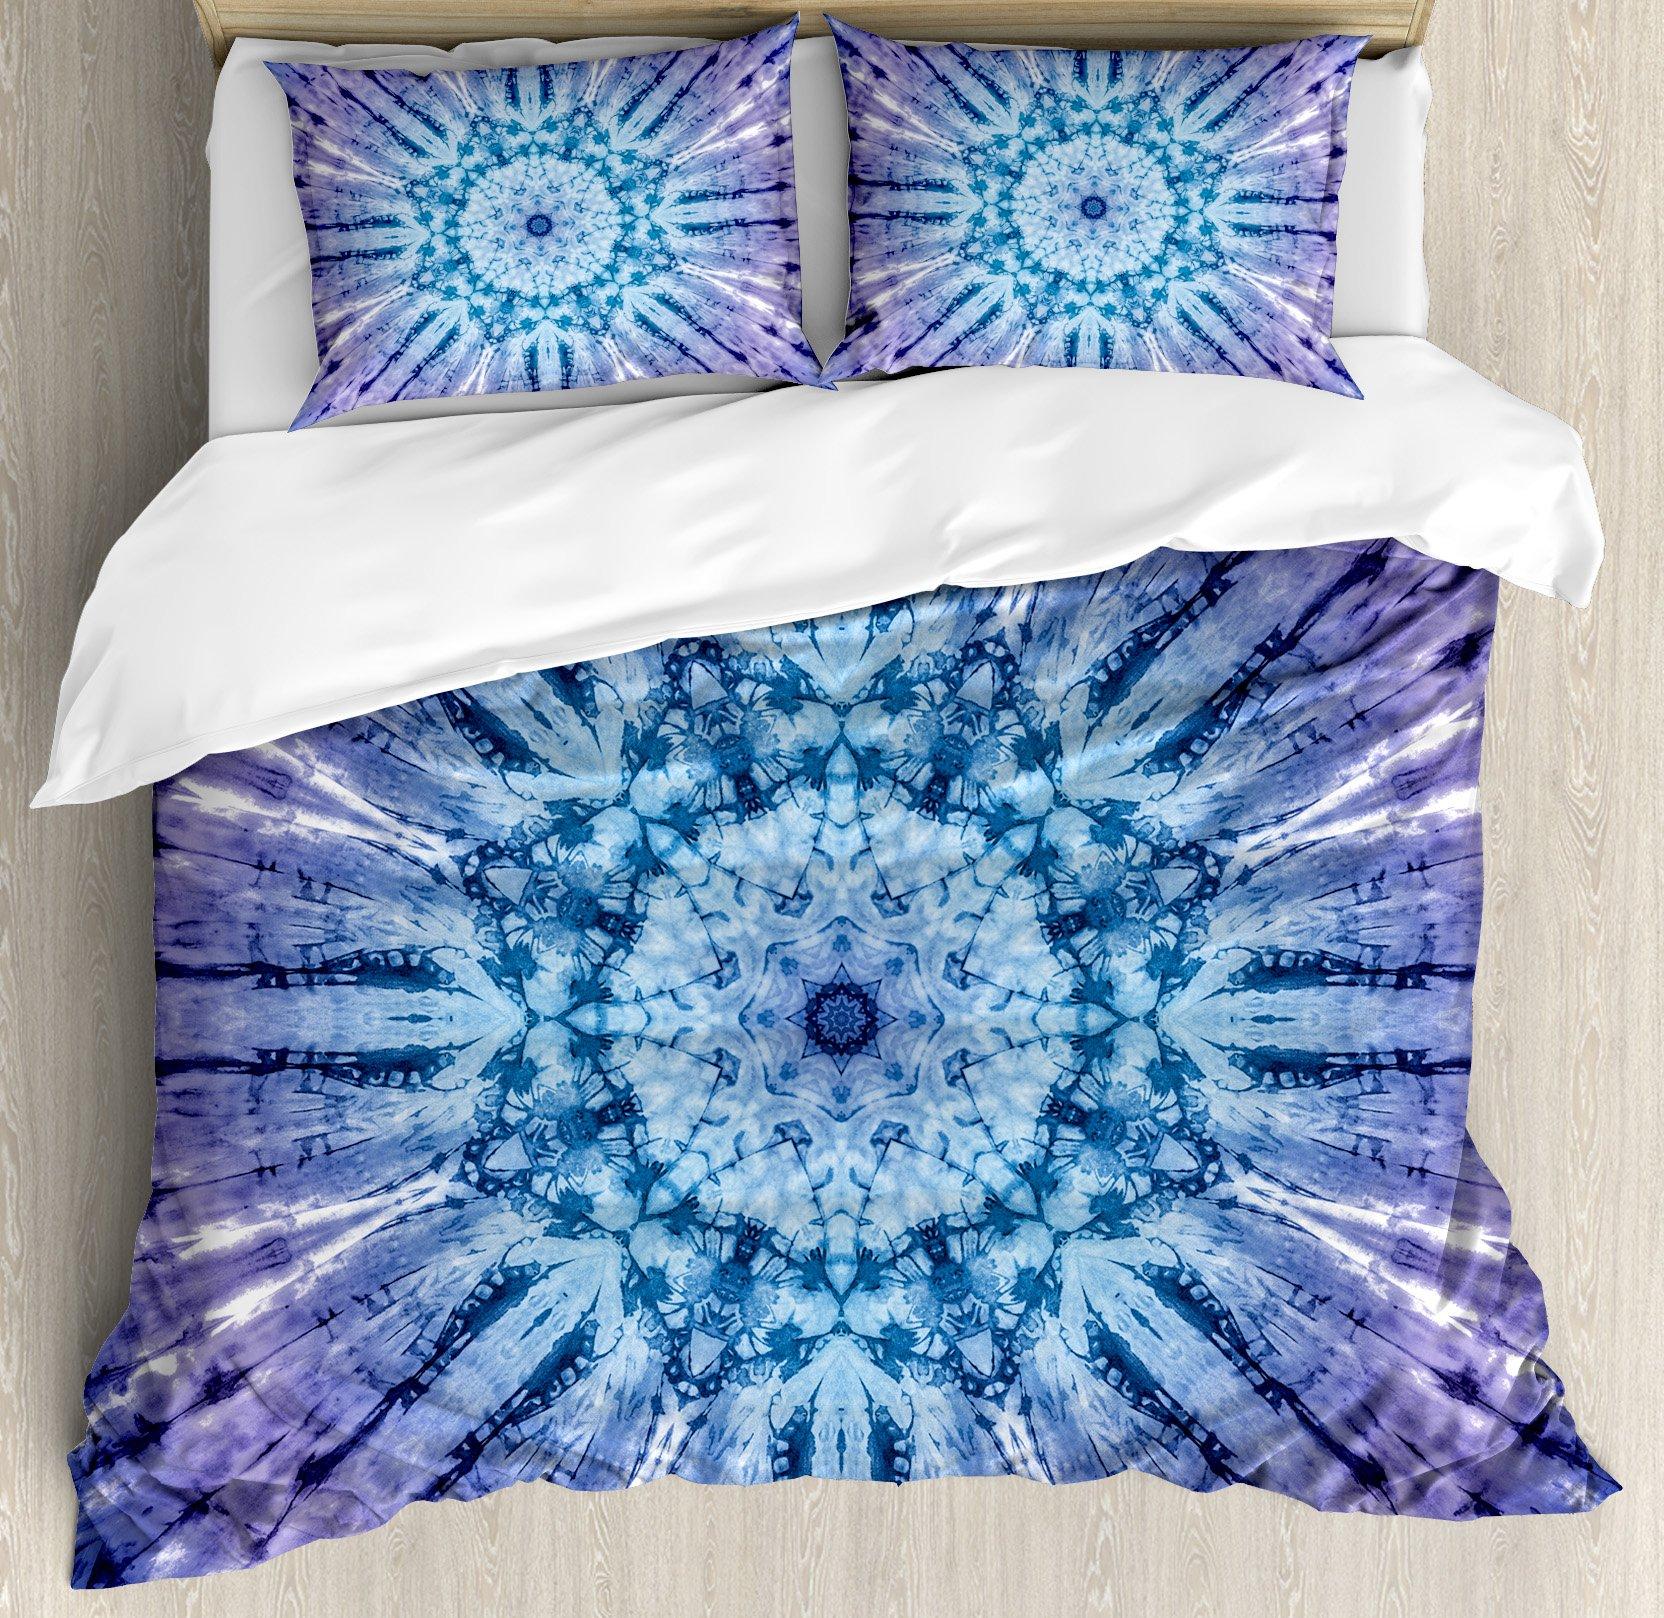 Ambesonne Mandala Duvet Cover Set King Size, Original Circle Mandala Motif Centered Vibrant and Spectral Color Motion Graphic, Decorative 3 Piece Bedding Set with 2 Pillow Shams, Purple Blue